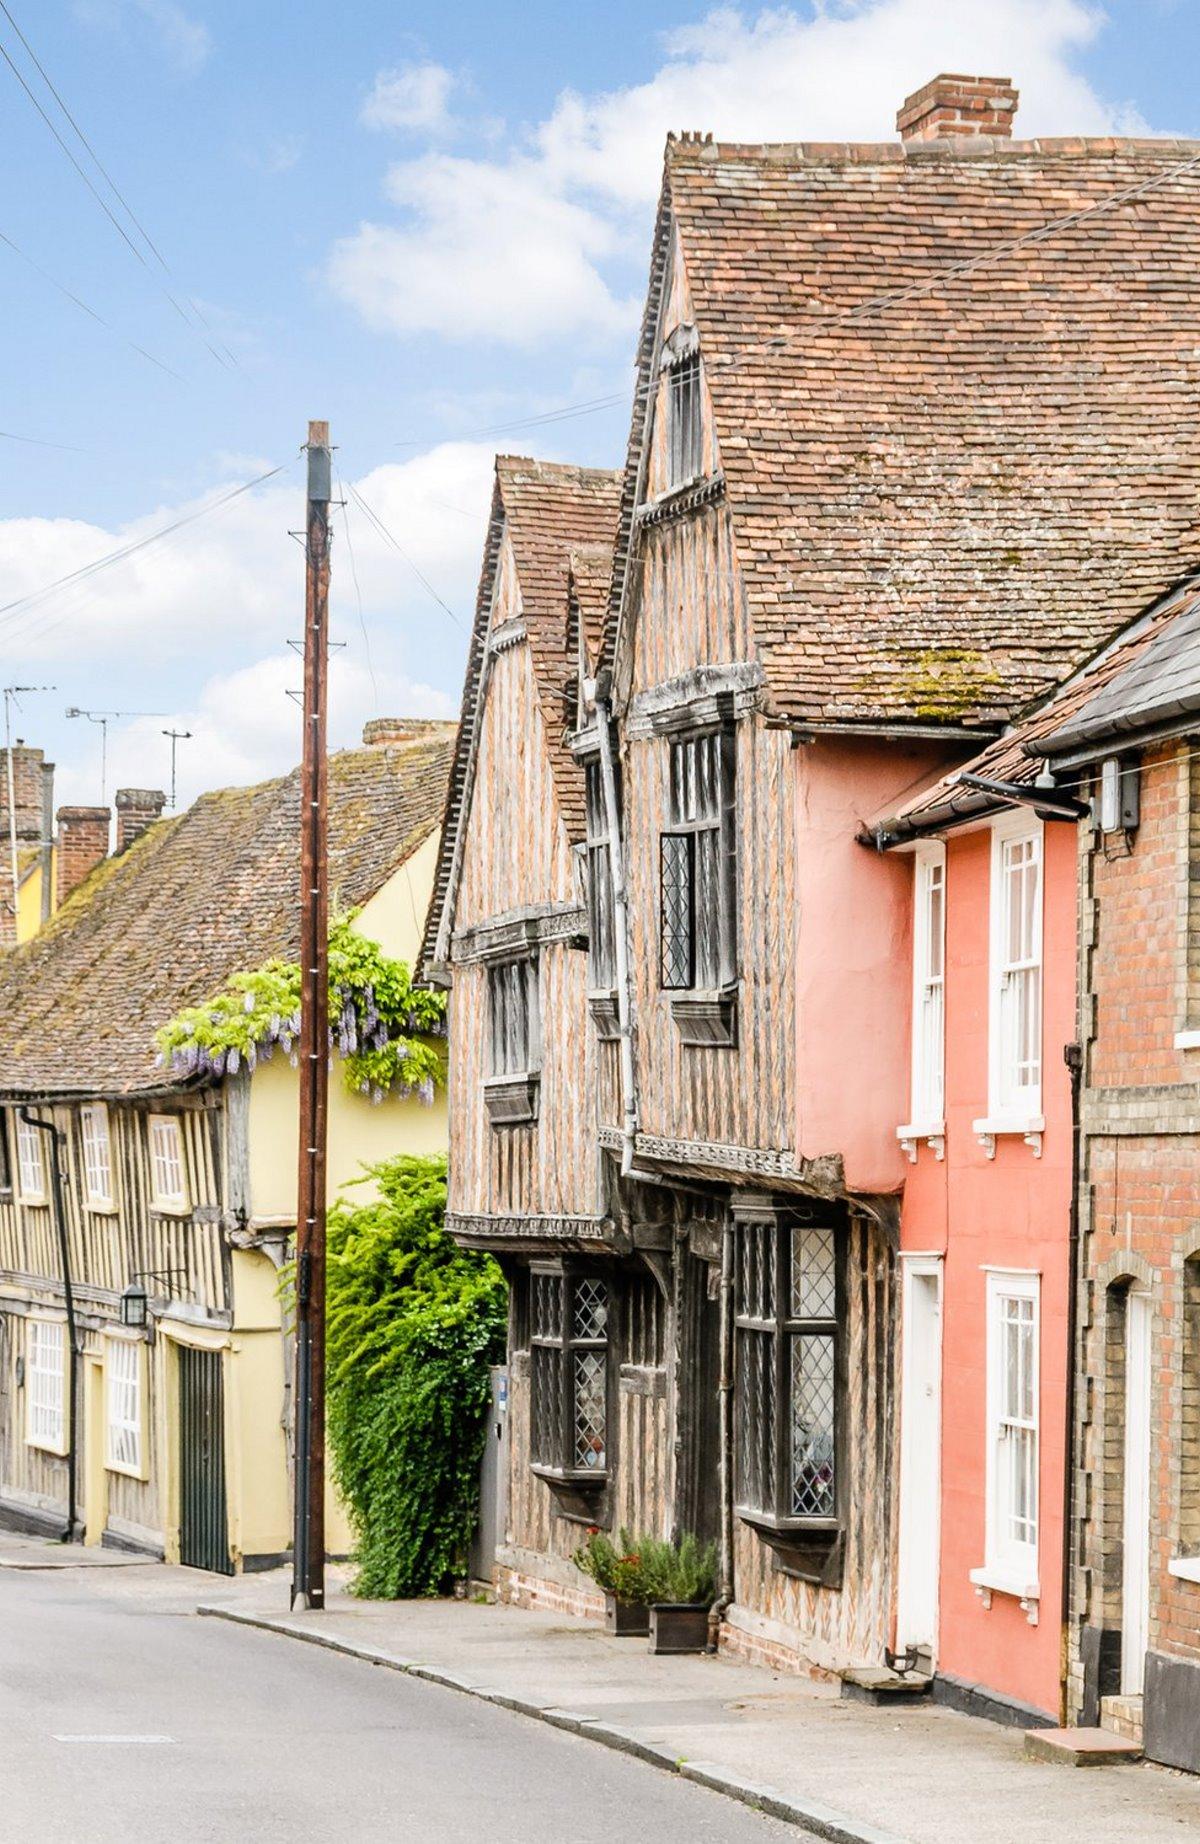 Lavenham, Αγγλία παραδοσιακά σπίτια